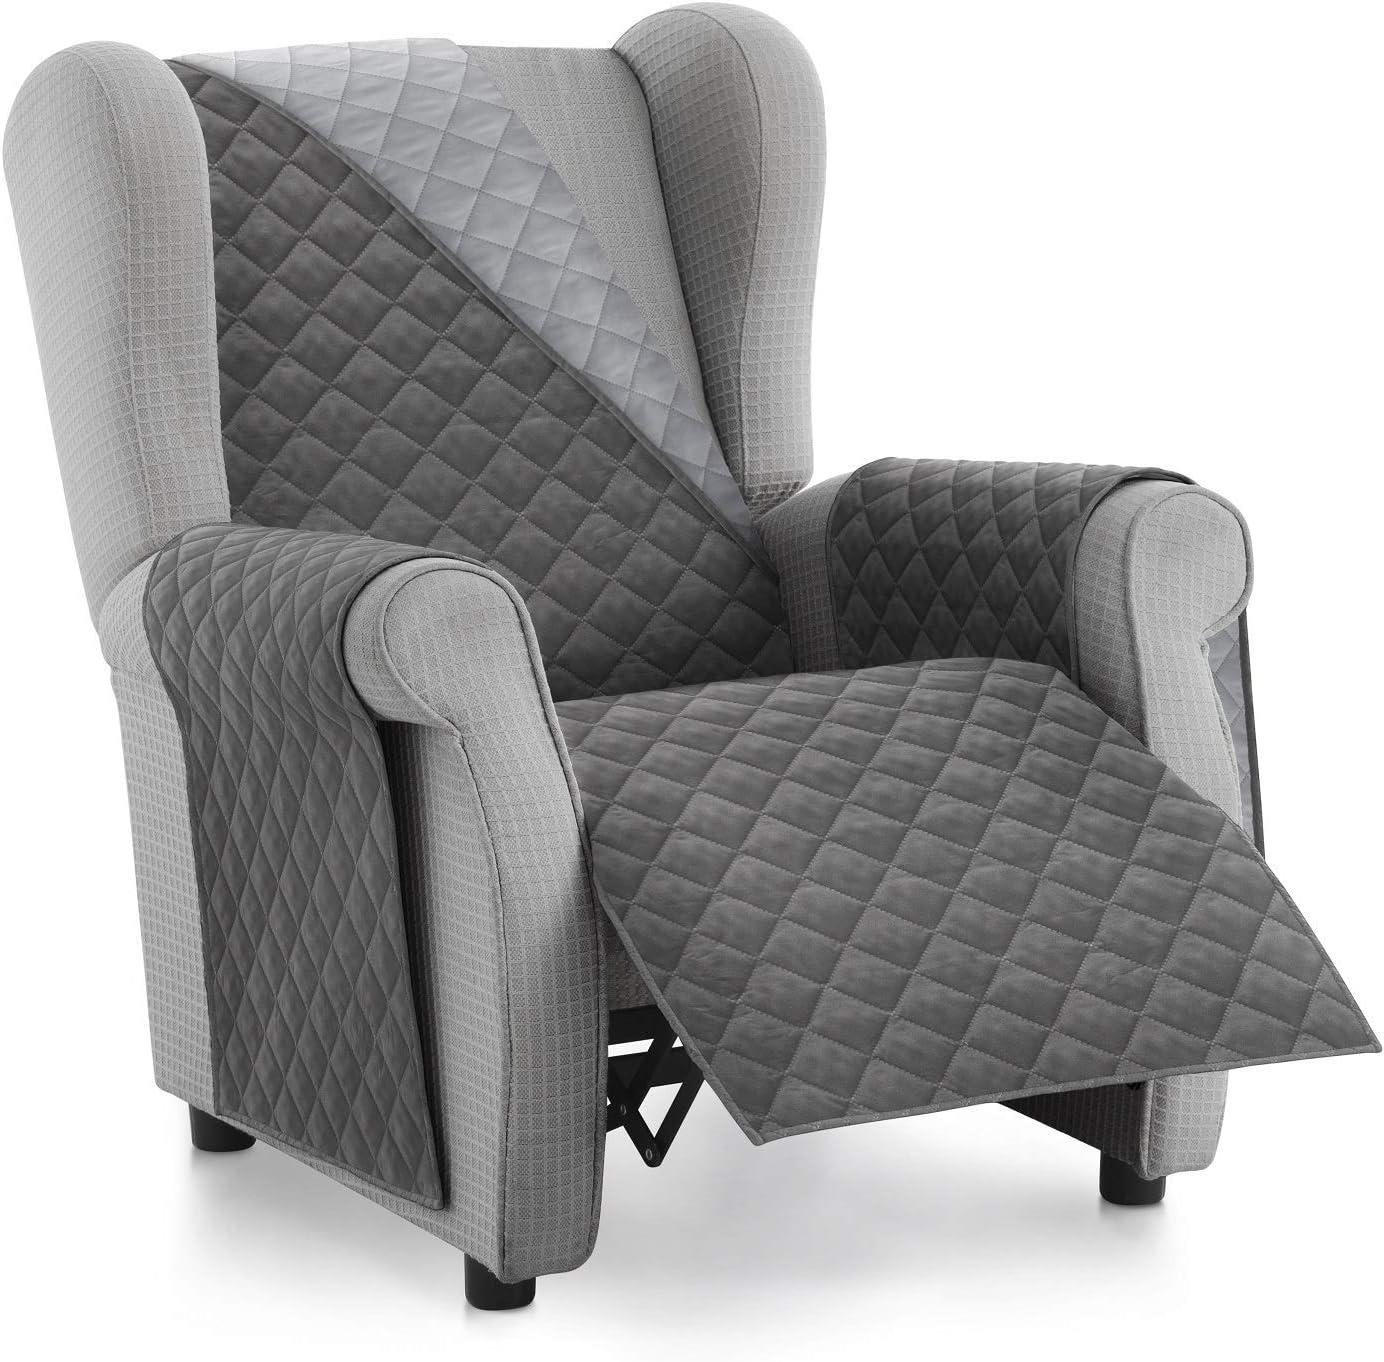 Textilhome - Funda Cubre Sofá Malu -1 Plaza - Relax - Protector para Sofás Acolchado Reversible. Color Gris C/3